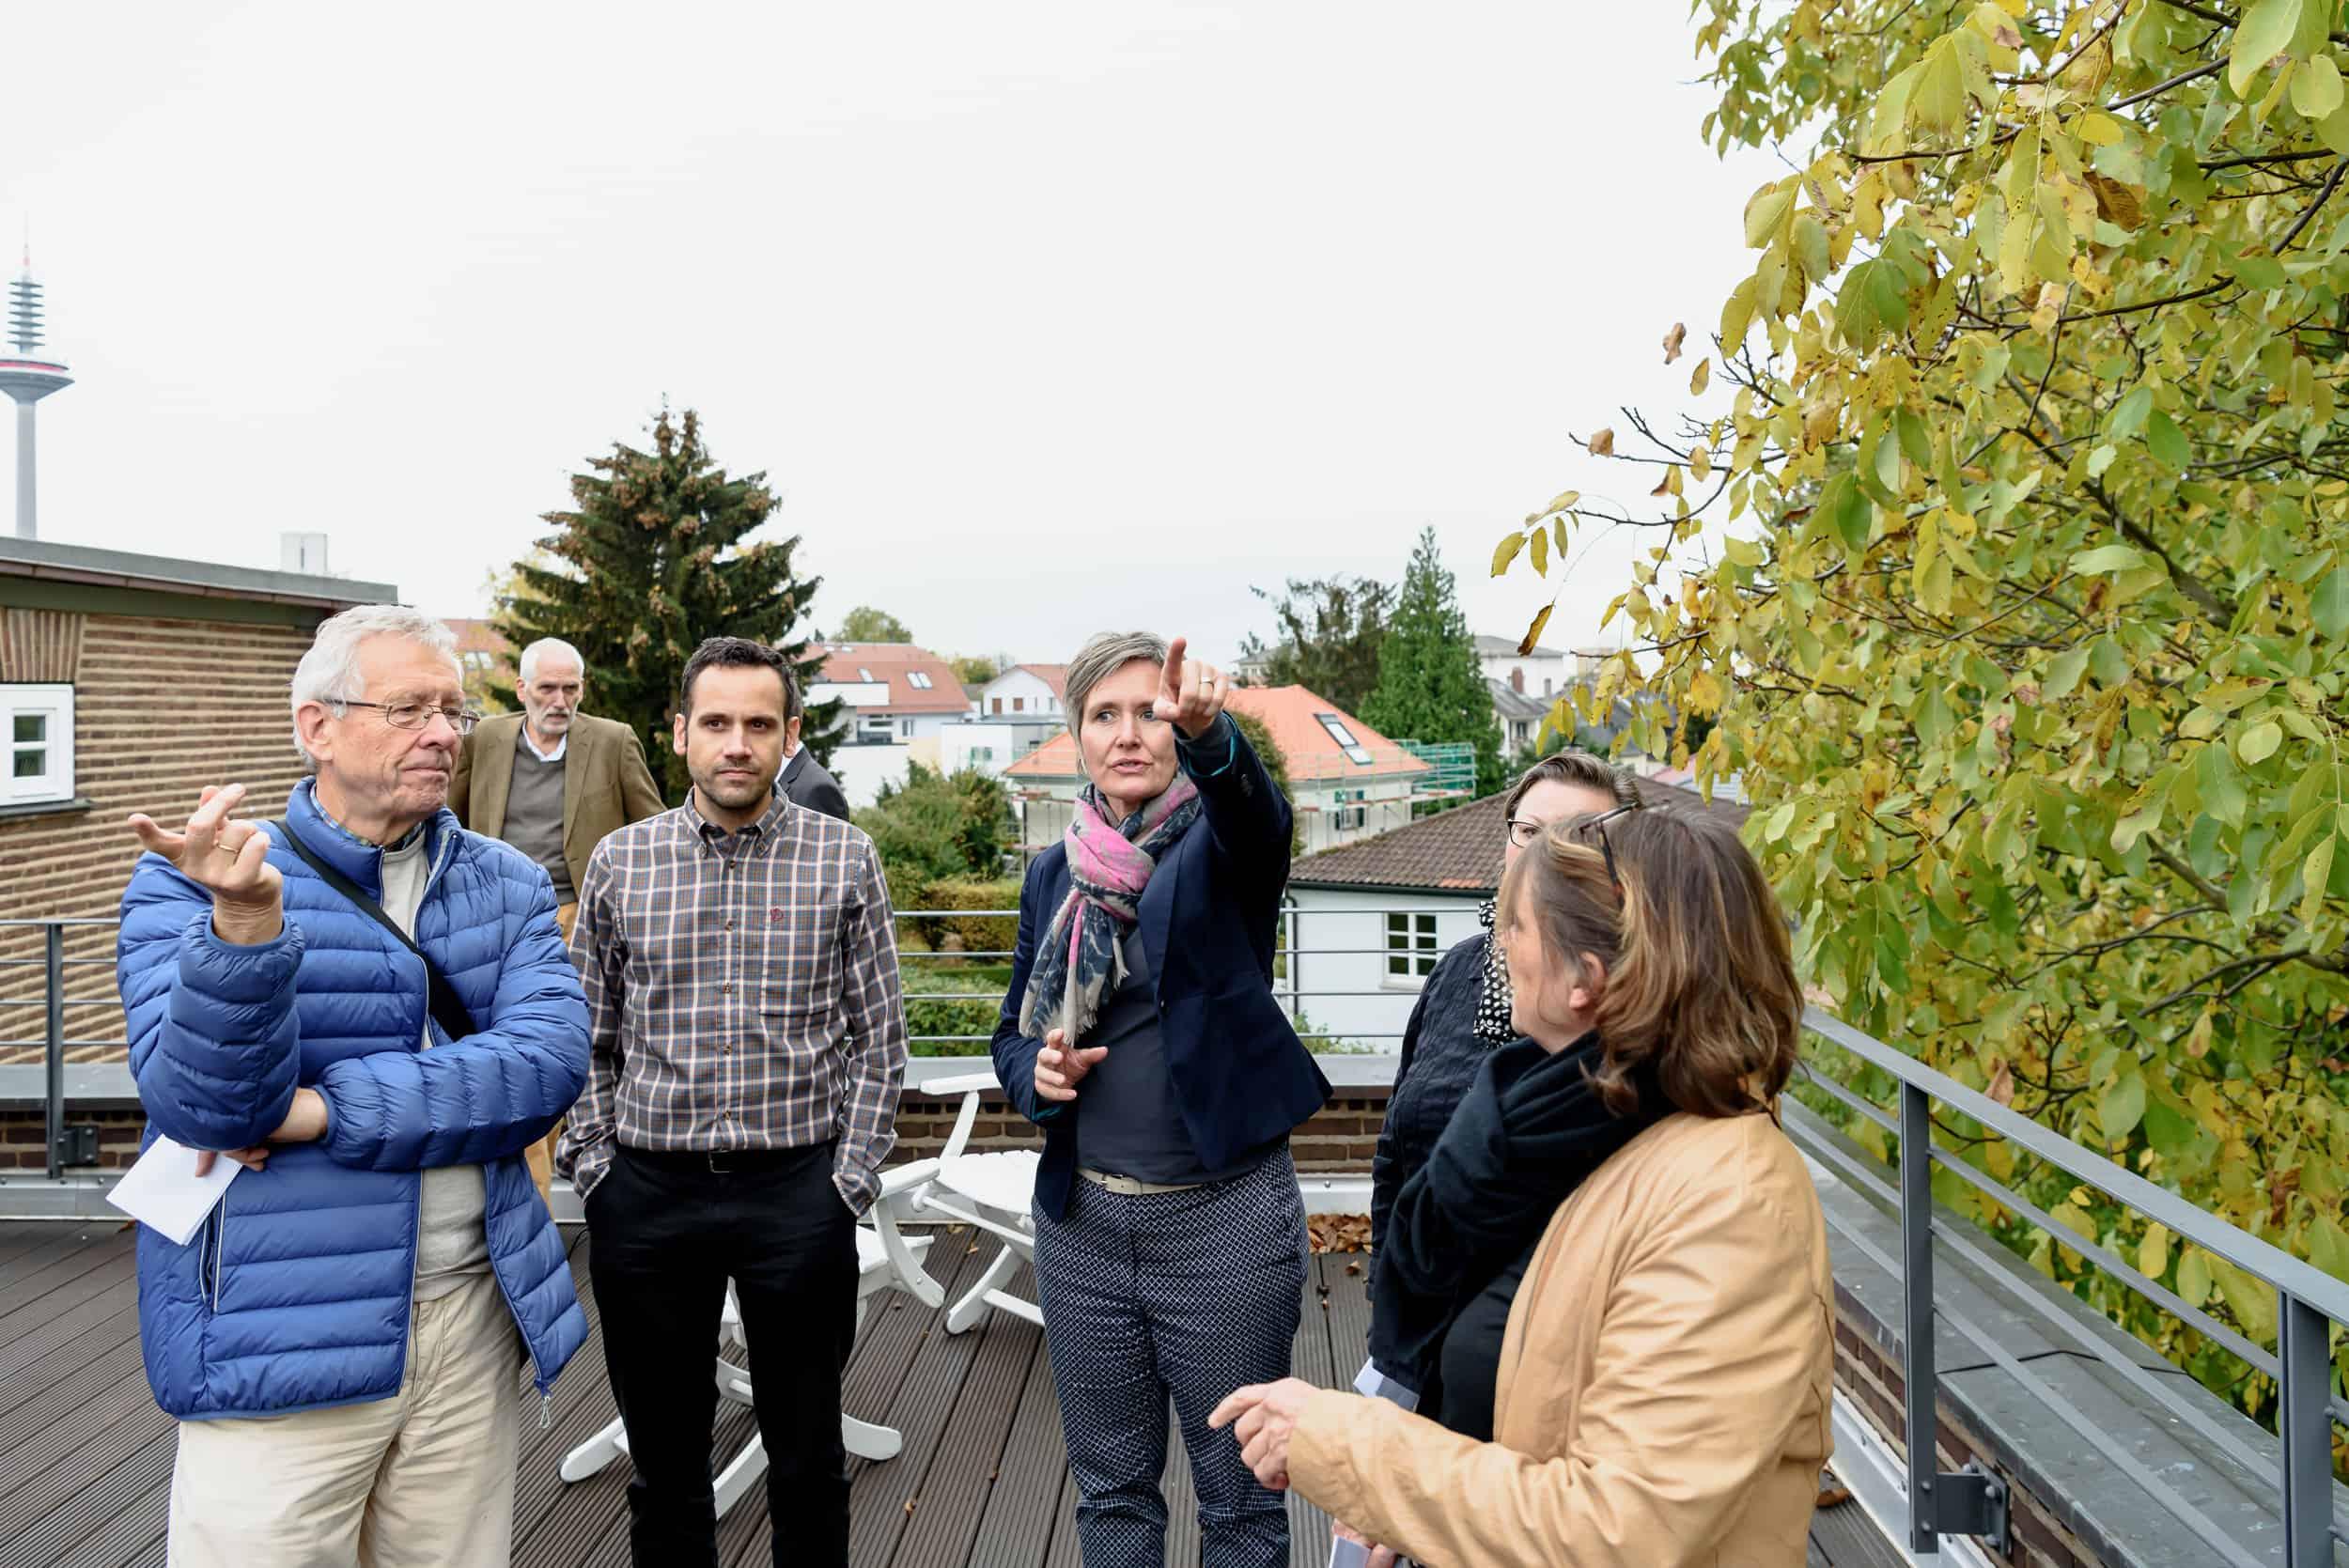 Freunde vor Ort: Elsaesser Haus